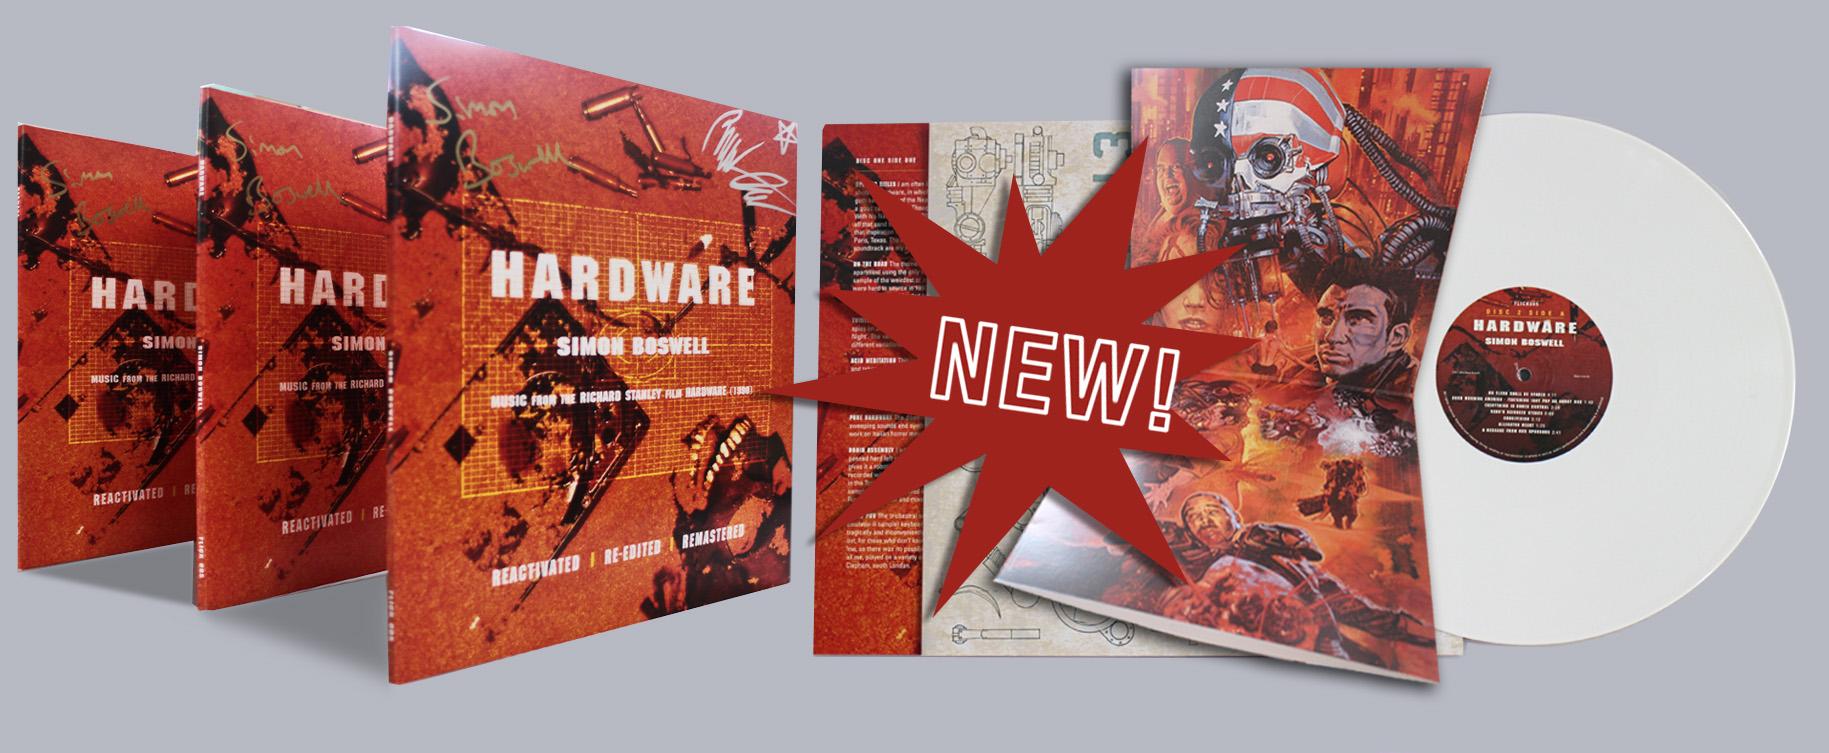 HARDWARE (Original 1990 Motion Picture Soundtrack)